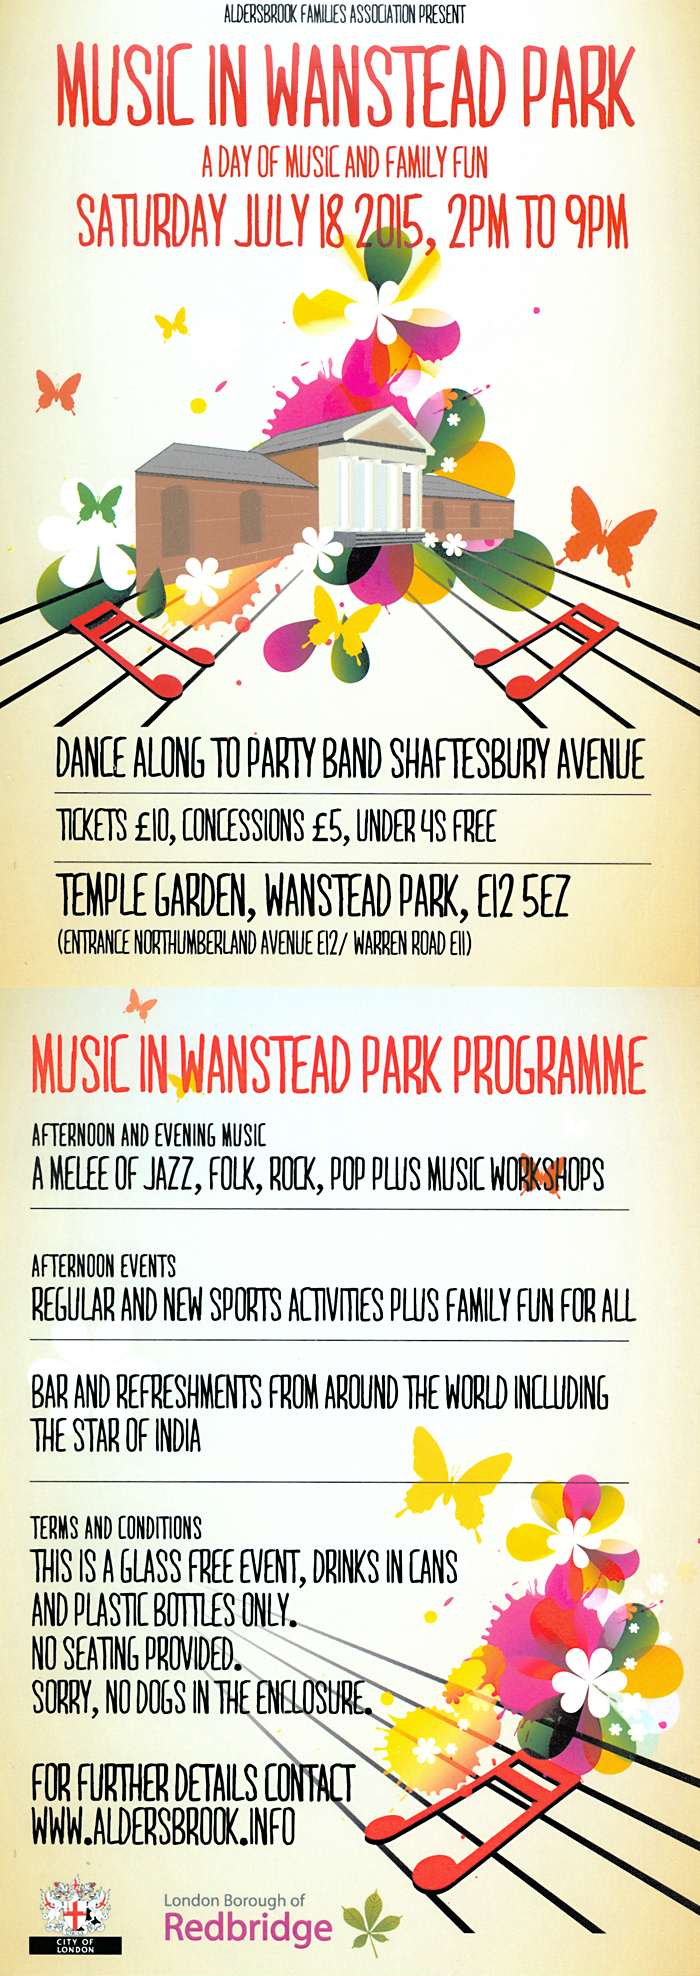 20150718 Music in Wanstead Park0001+2 vert 700px